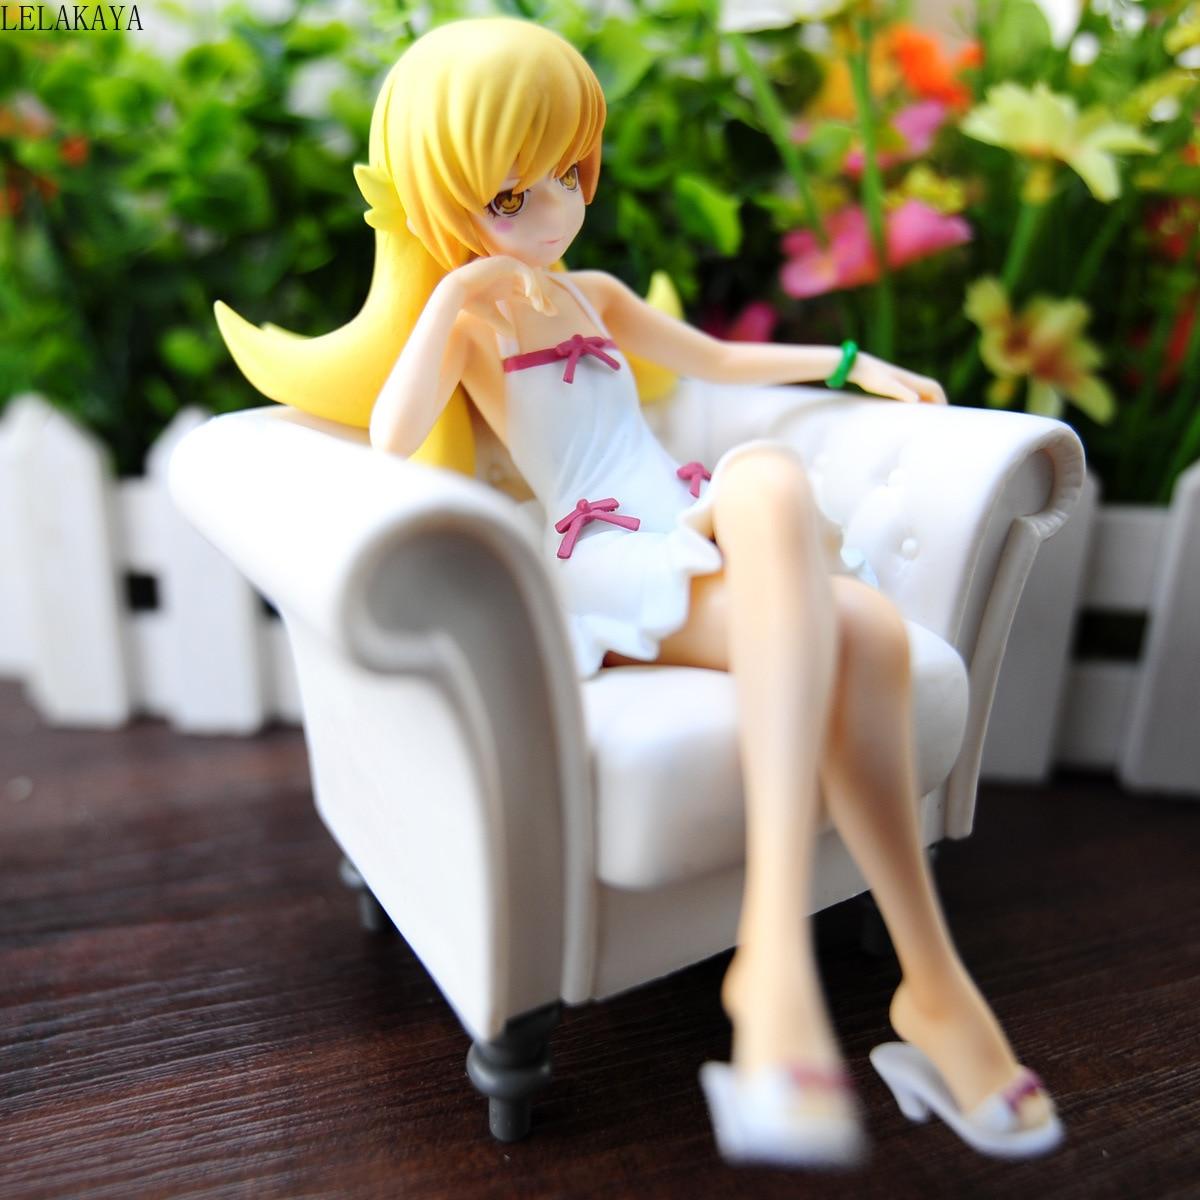 Toys & Hobbies Action Anime Figure Nisemonogatari Oshino Shinobu Sofa Ver Model 1/8 Scale Painted Model Pvc Collectible Decoration Doll 13cm Modern And Elegant In Fashion